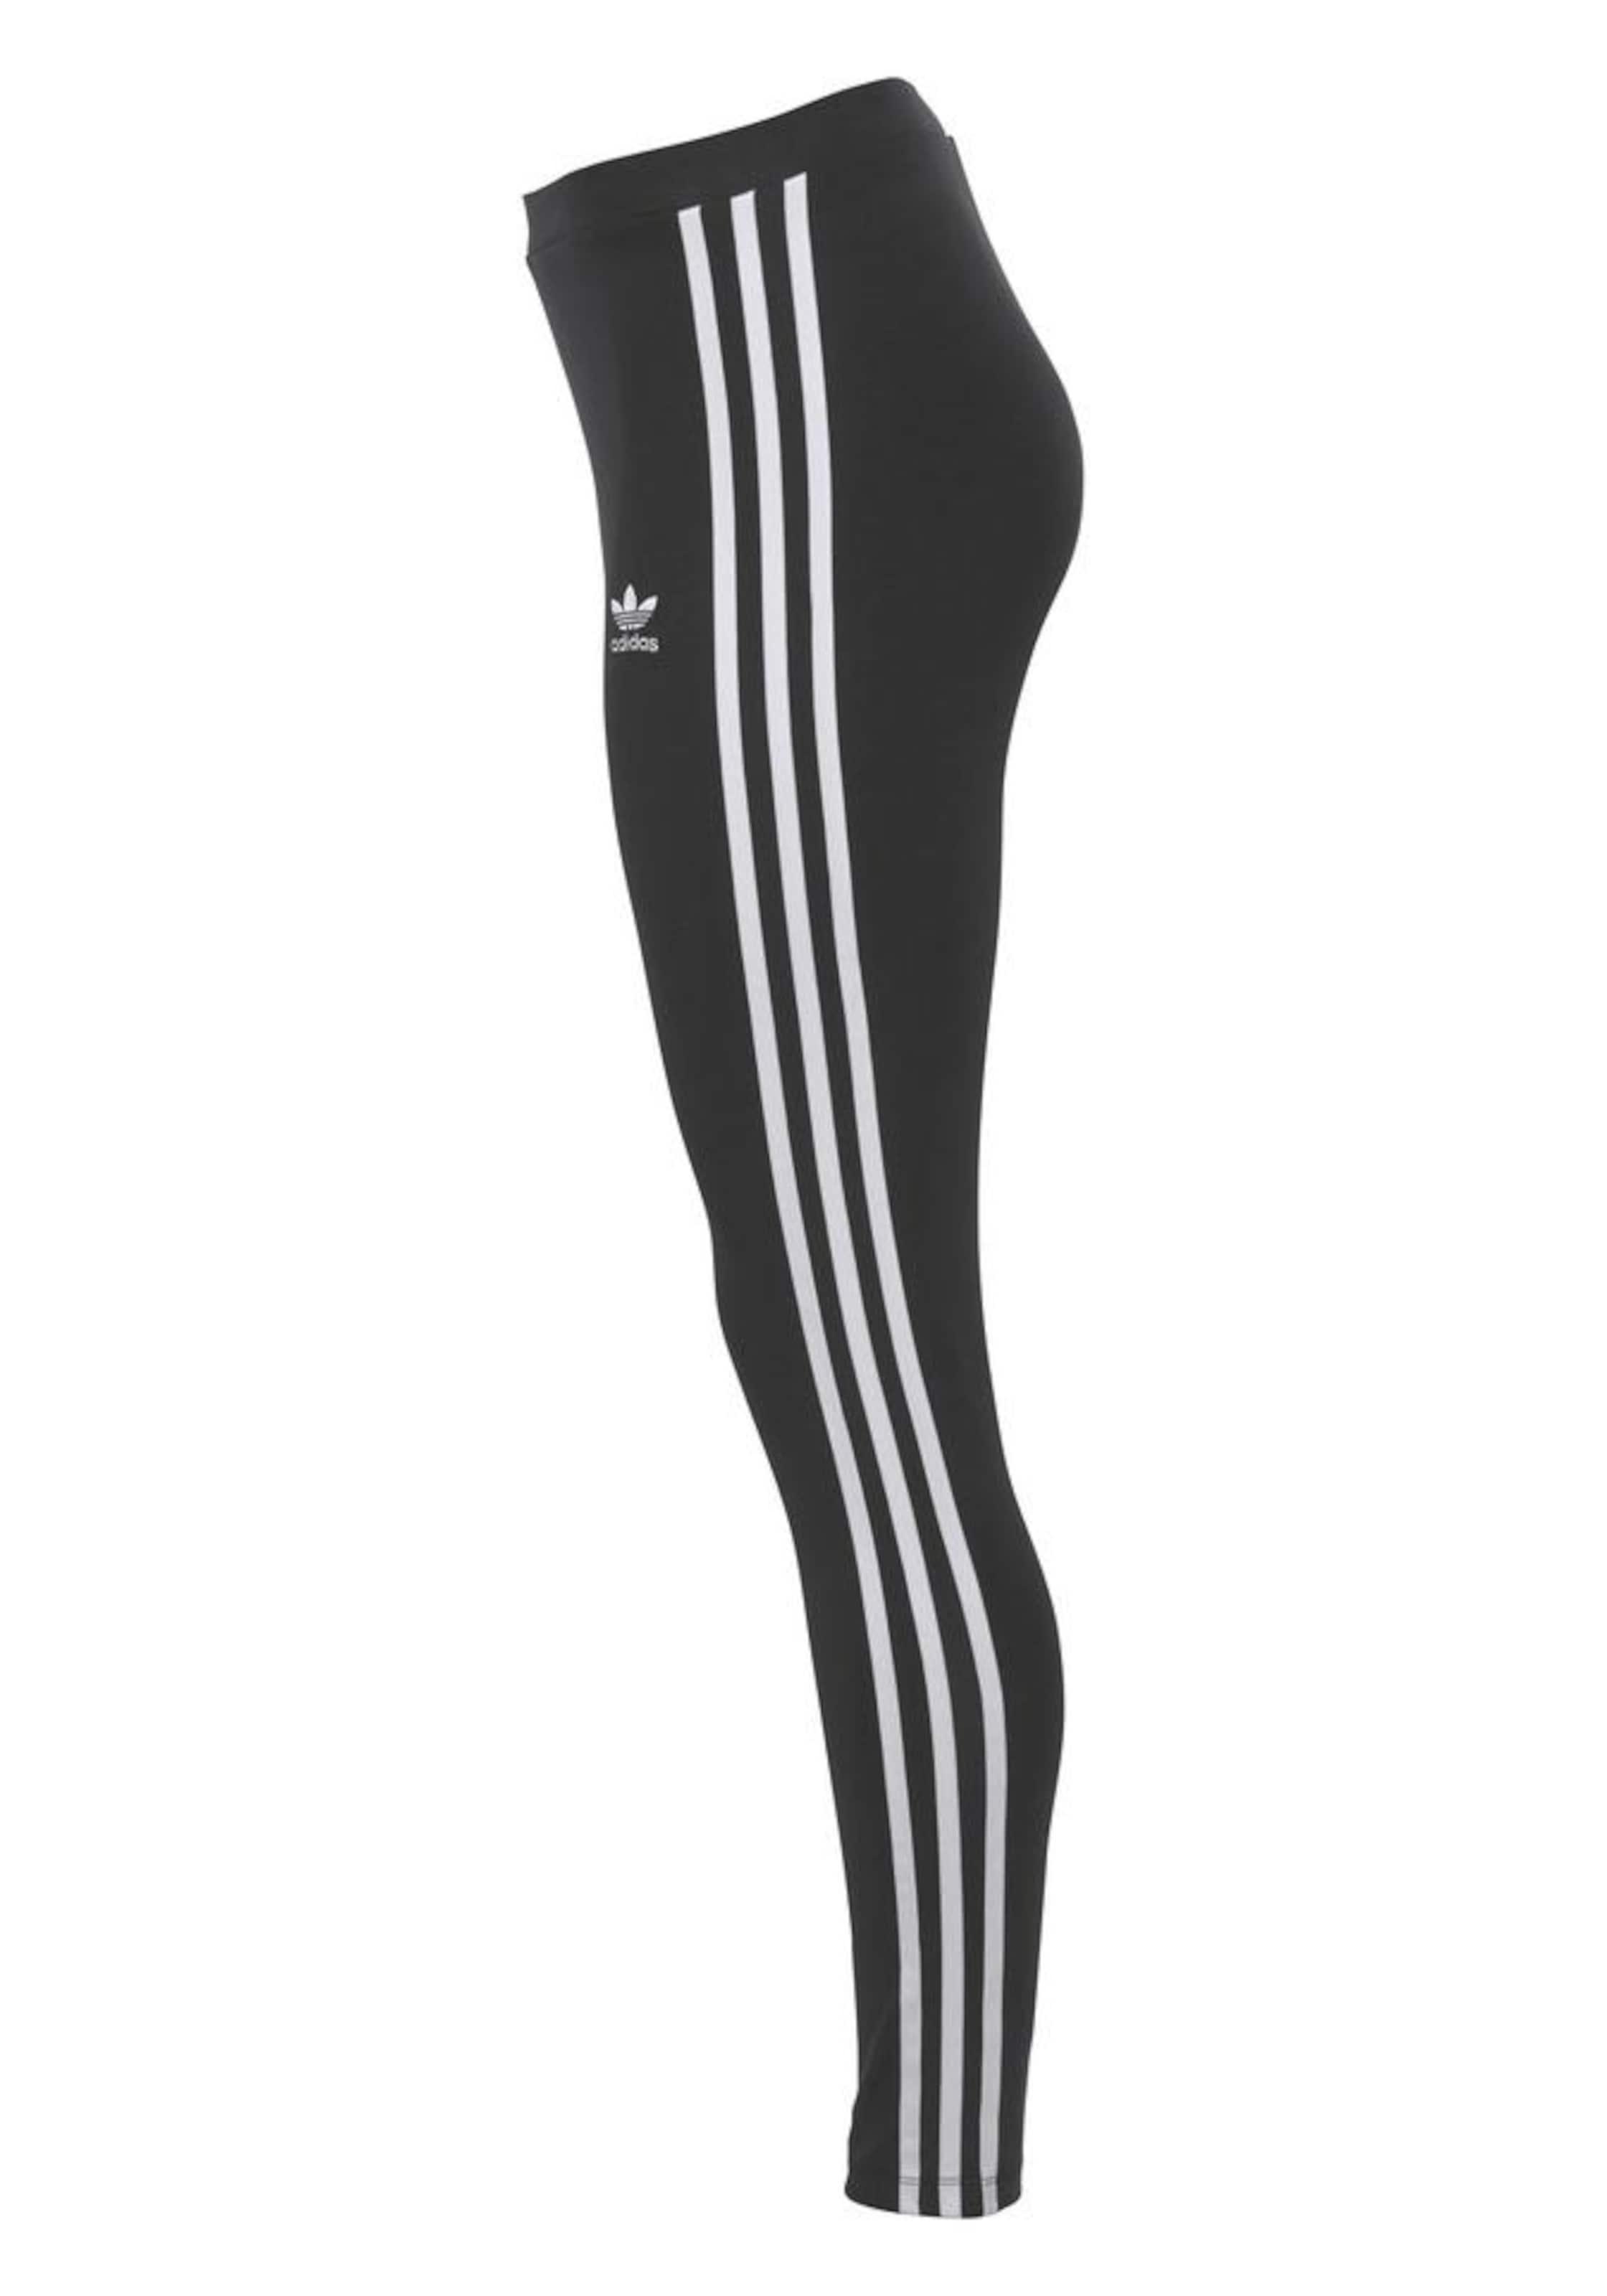 Adidas En NoirBlanc Leggings Adidas Adidas En Originals Originals Leggings NoirBlanc j4A5RL